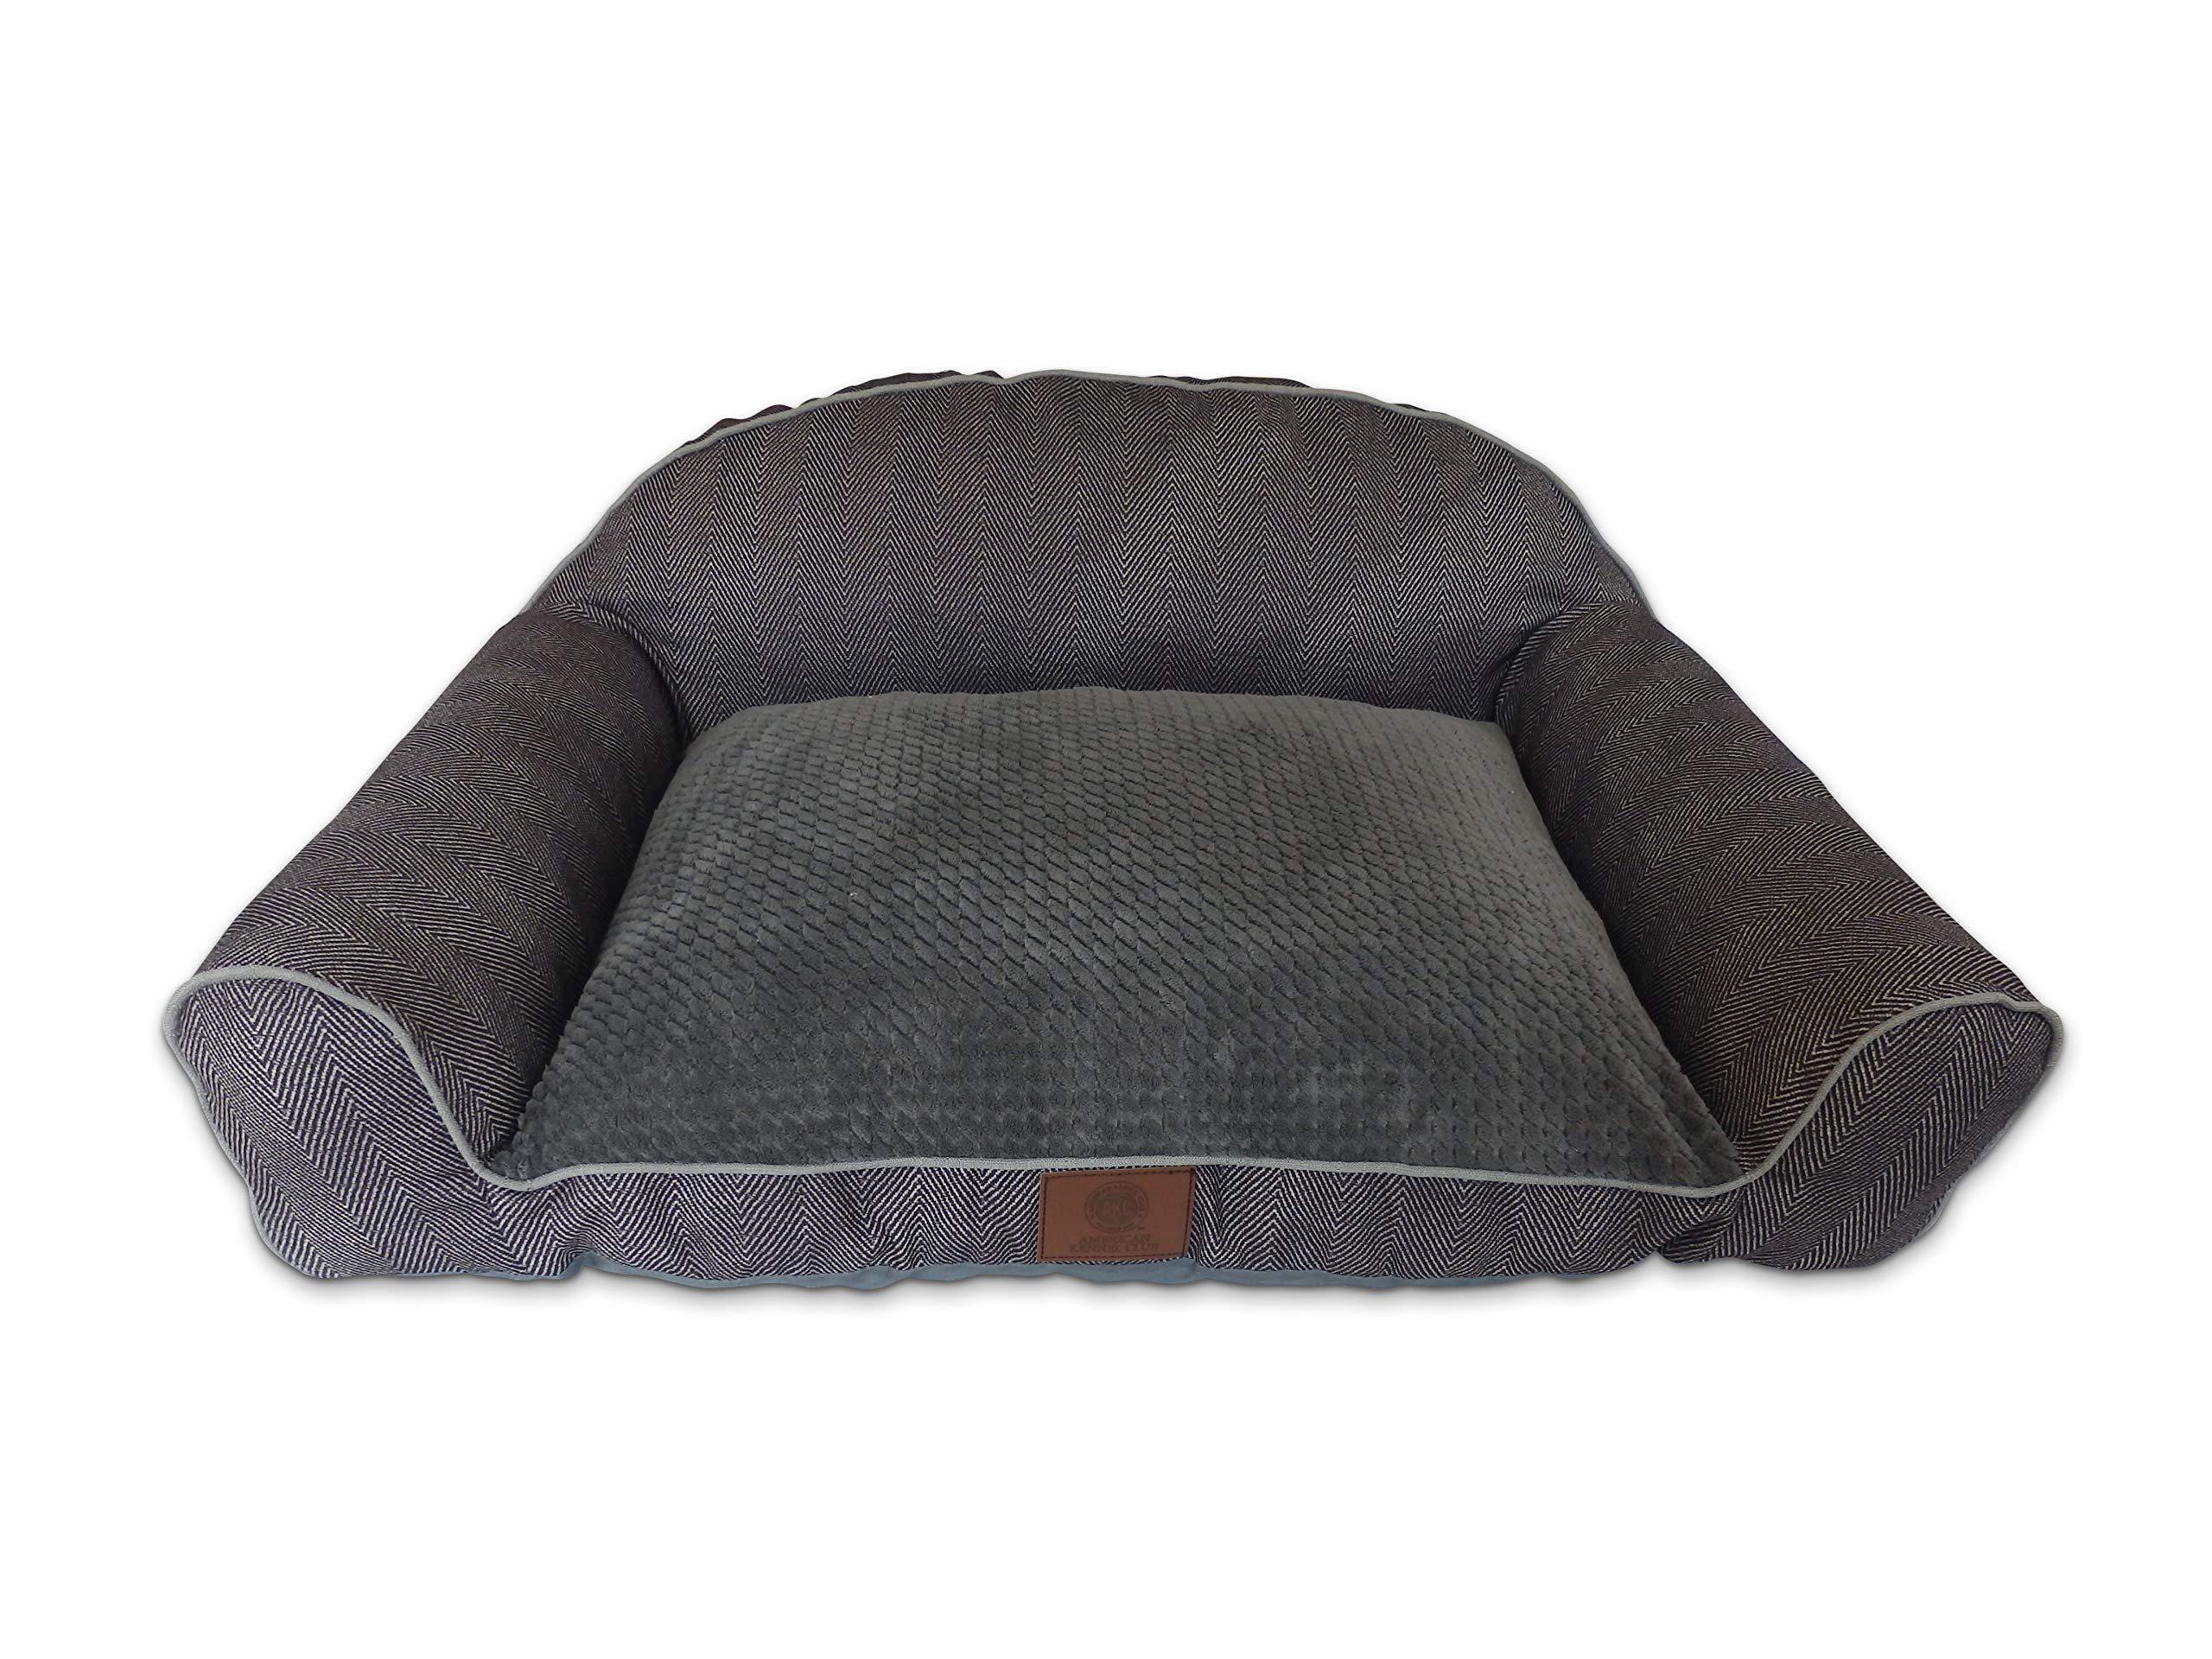 American Kennel Club AKC Premium Memory Foam Herringbone High Back Sofa Couch Pet Dog Bed w/Bolster Sides, Ultra Soft Pixel Sleep Surface, Gray by American Kennel Club